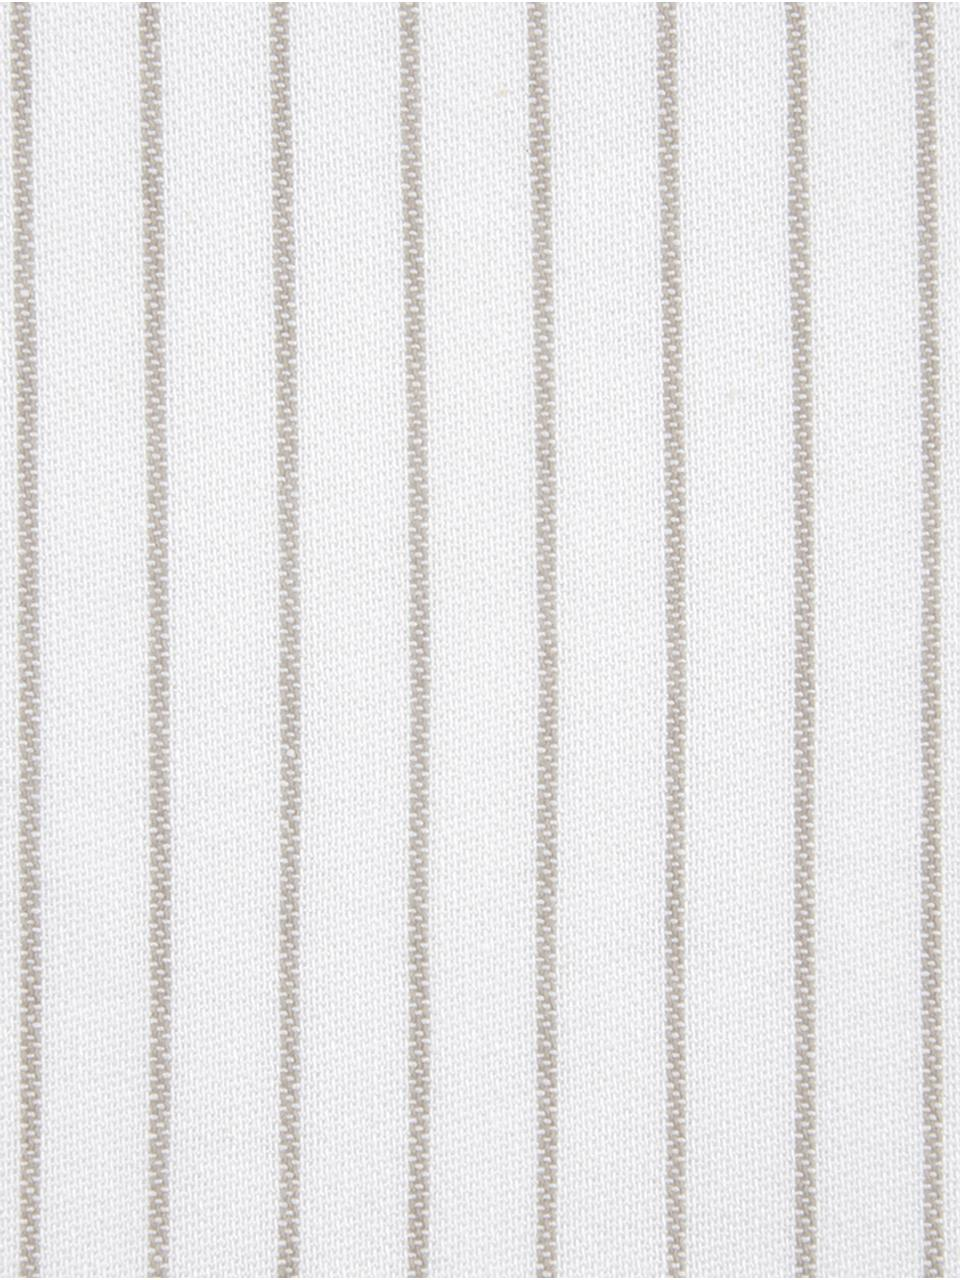 Tovaglietta americana Nicole 2 pz, Cotone, Bianco, beige, Larg. 40 x Lung. 50 cm